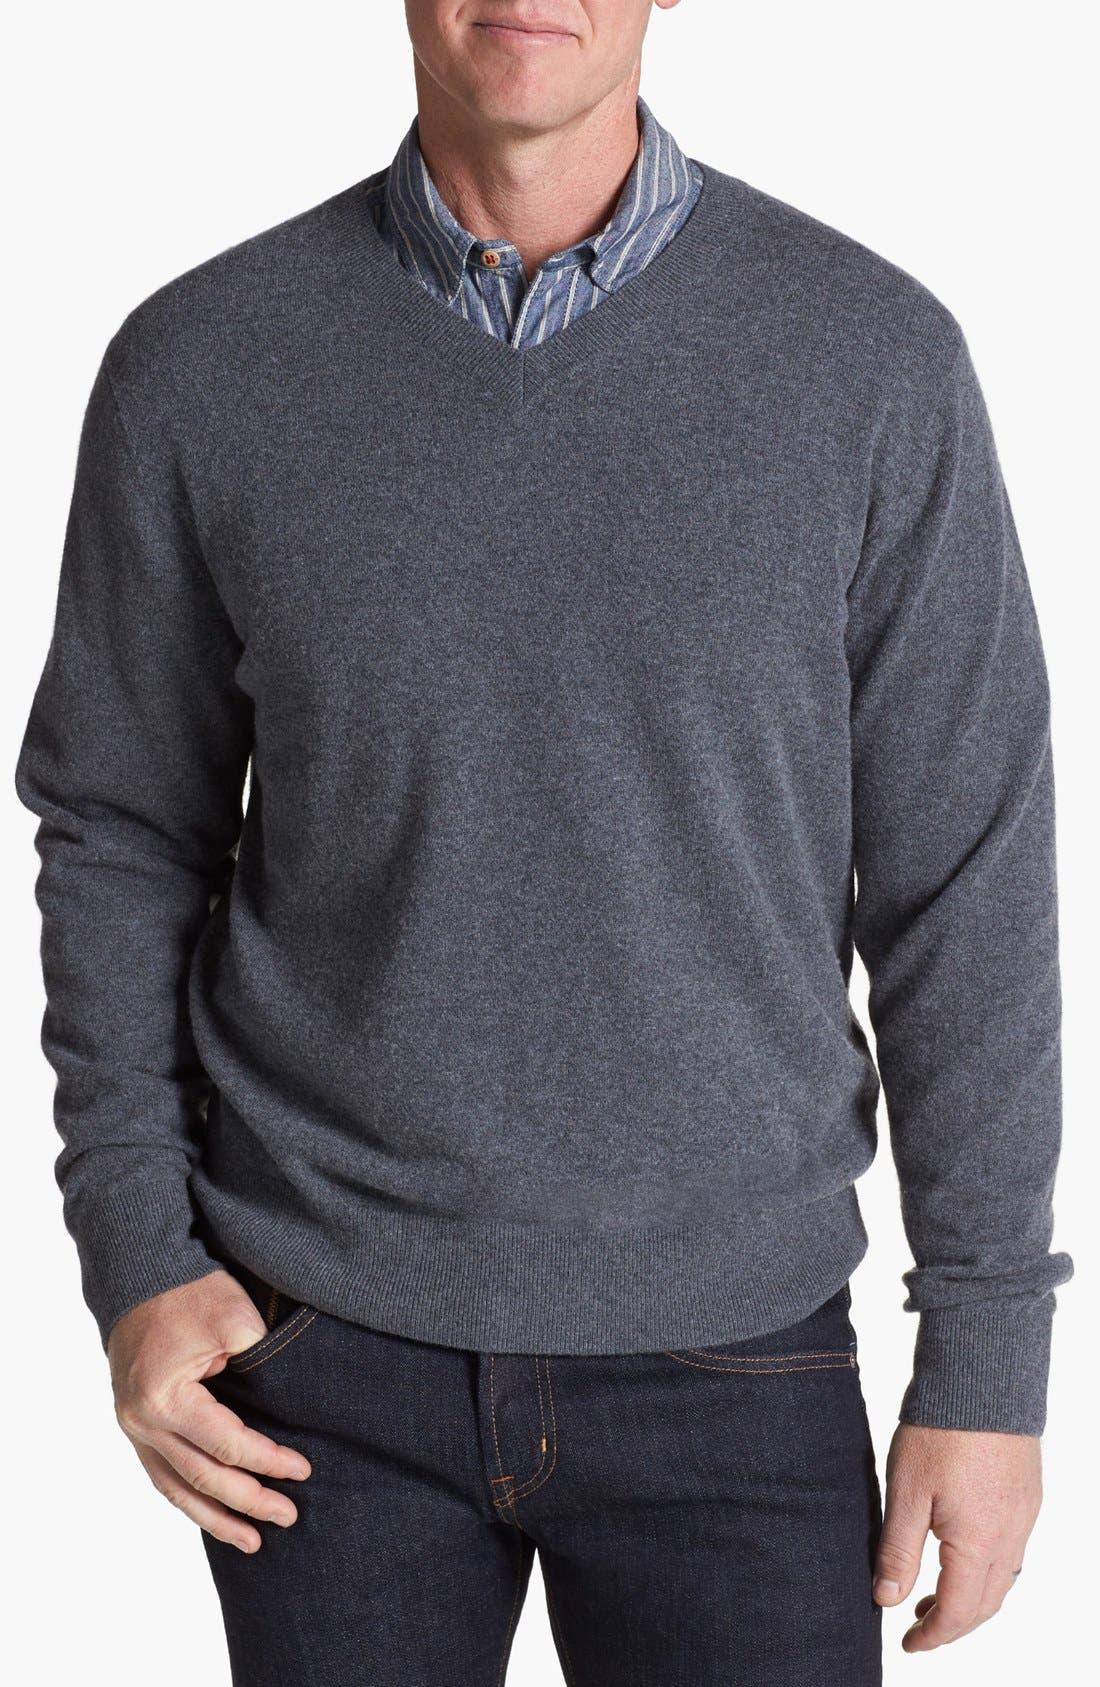 Alternate Image 1 Selected - Cutter & Buck 'Lake Union' V-Neck Sweater